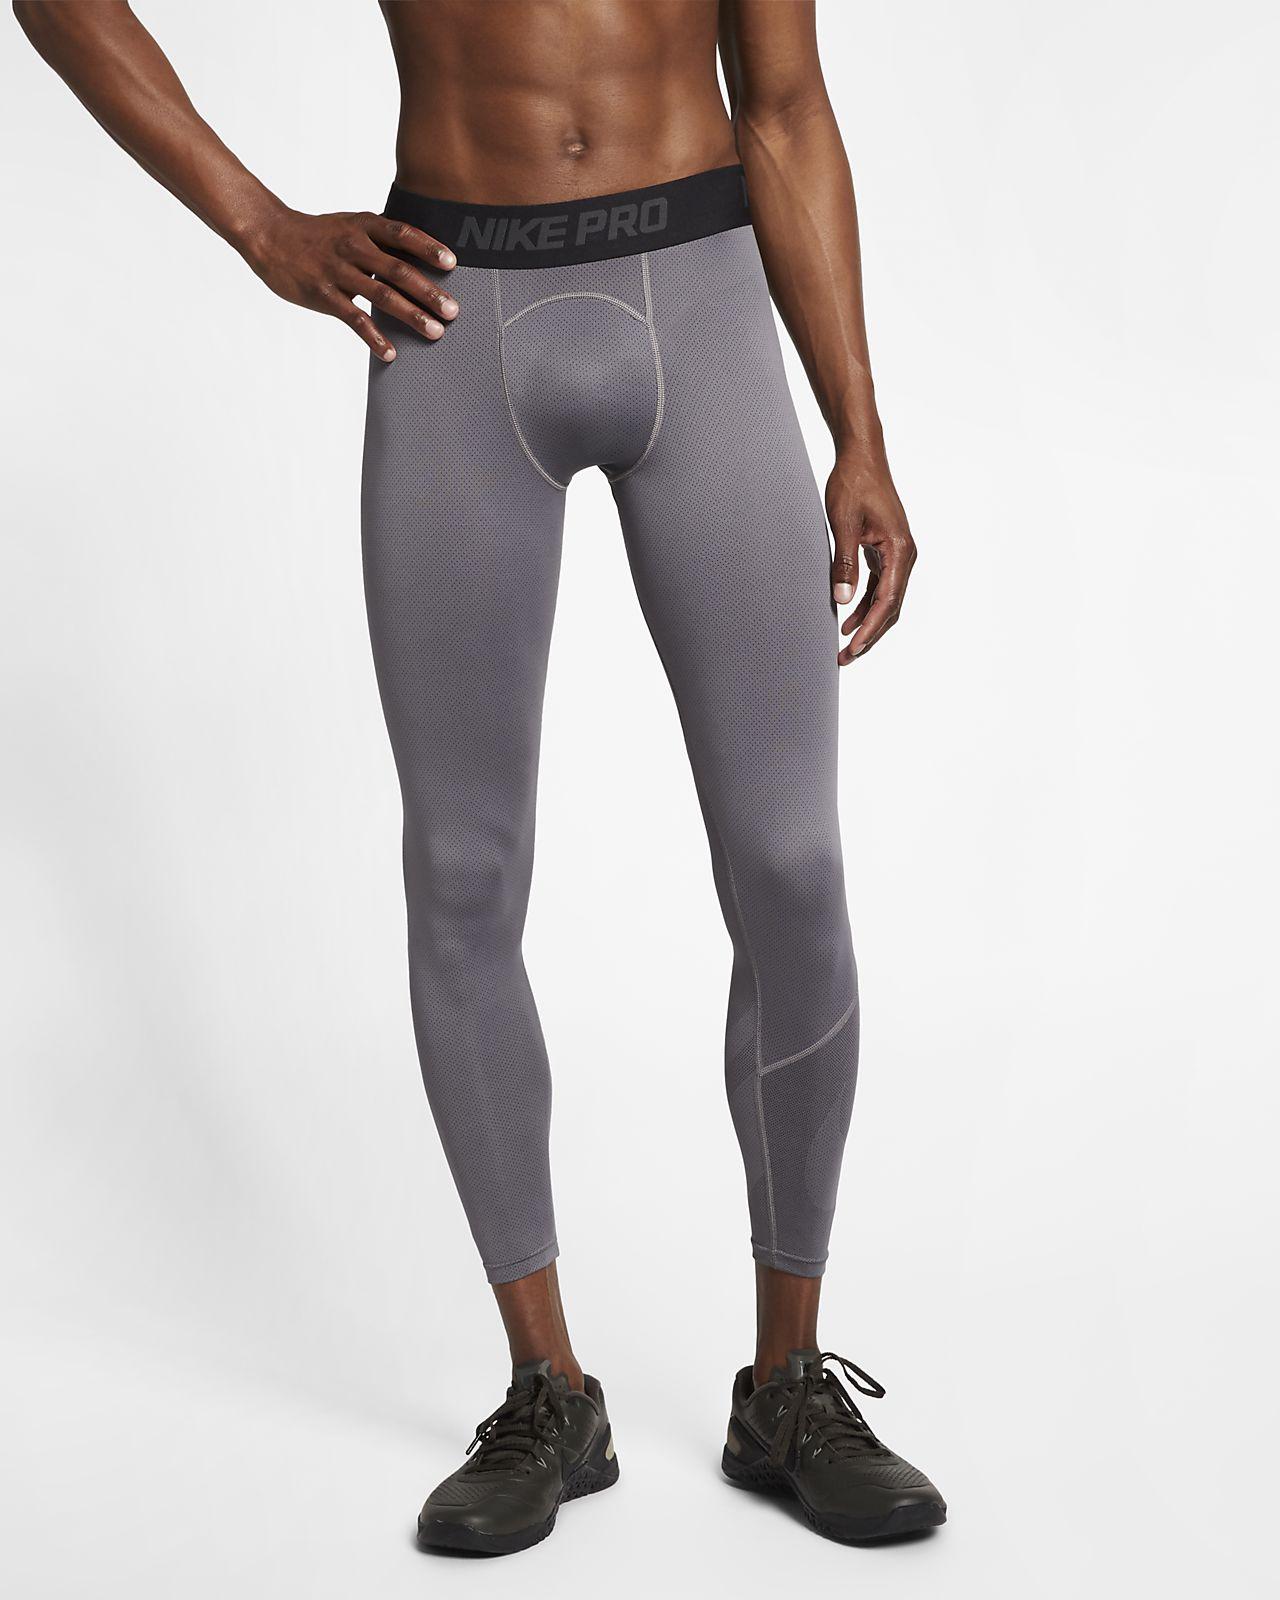 Nike Pro Men's Tights